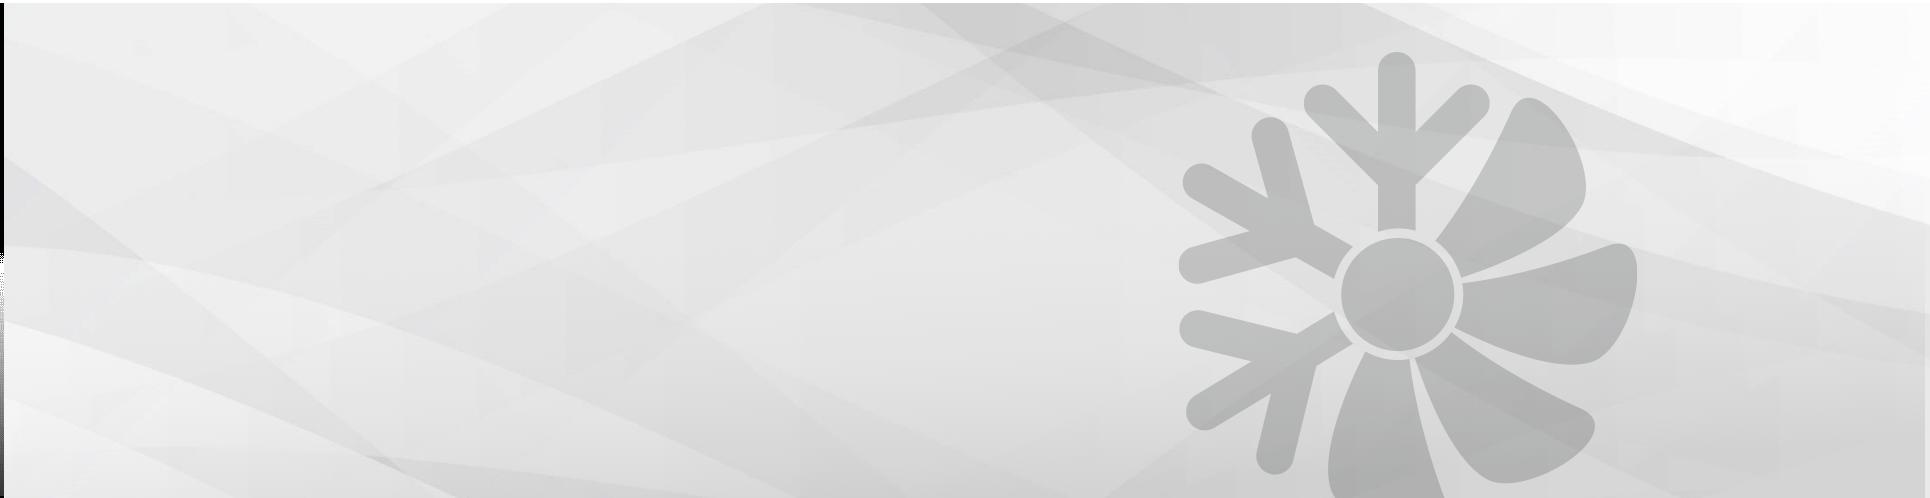 HVAC-icon-header.png